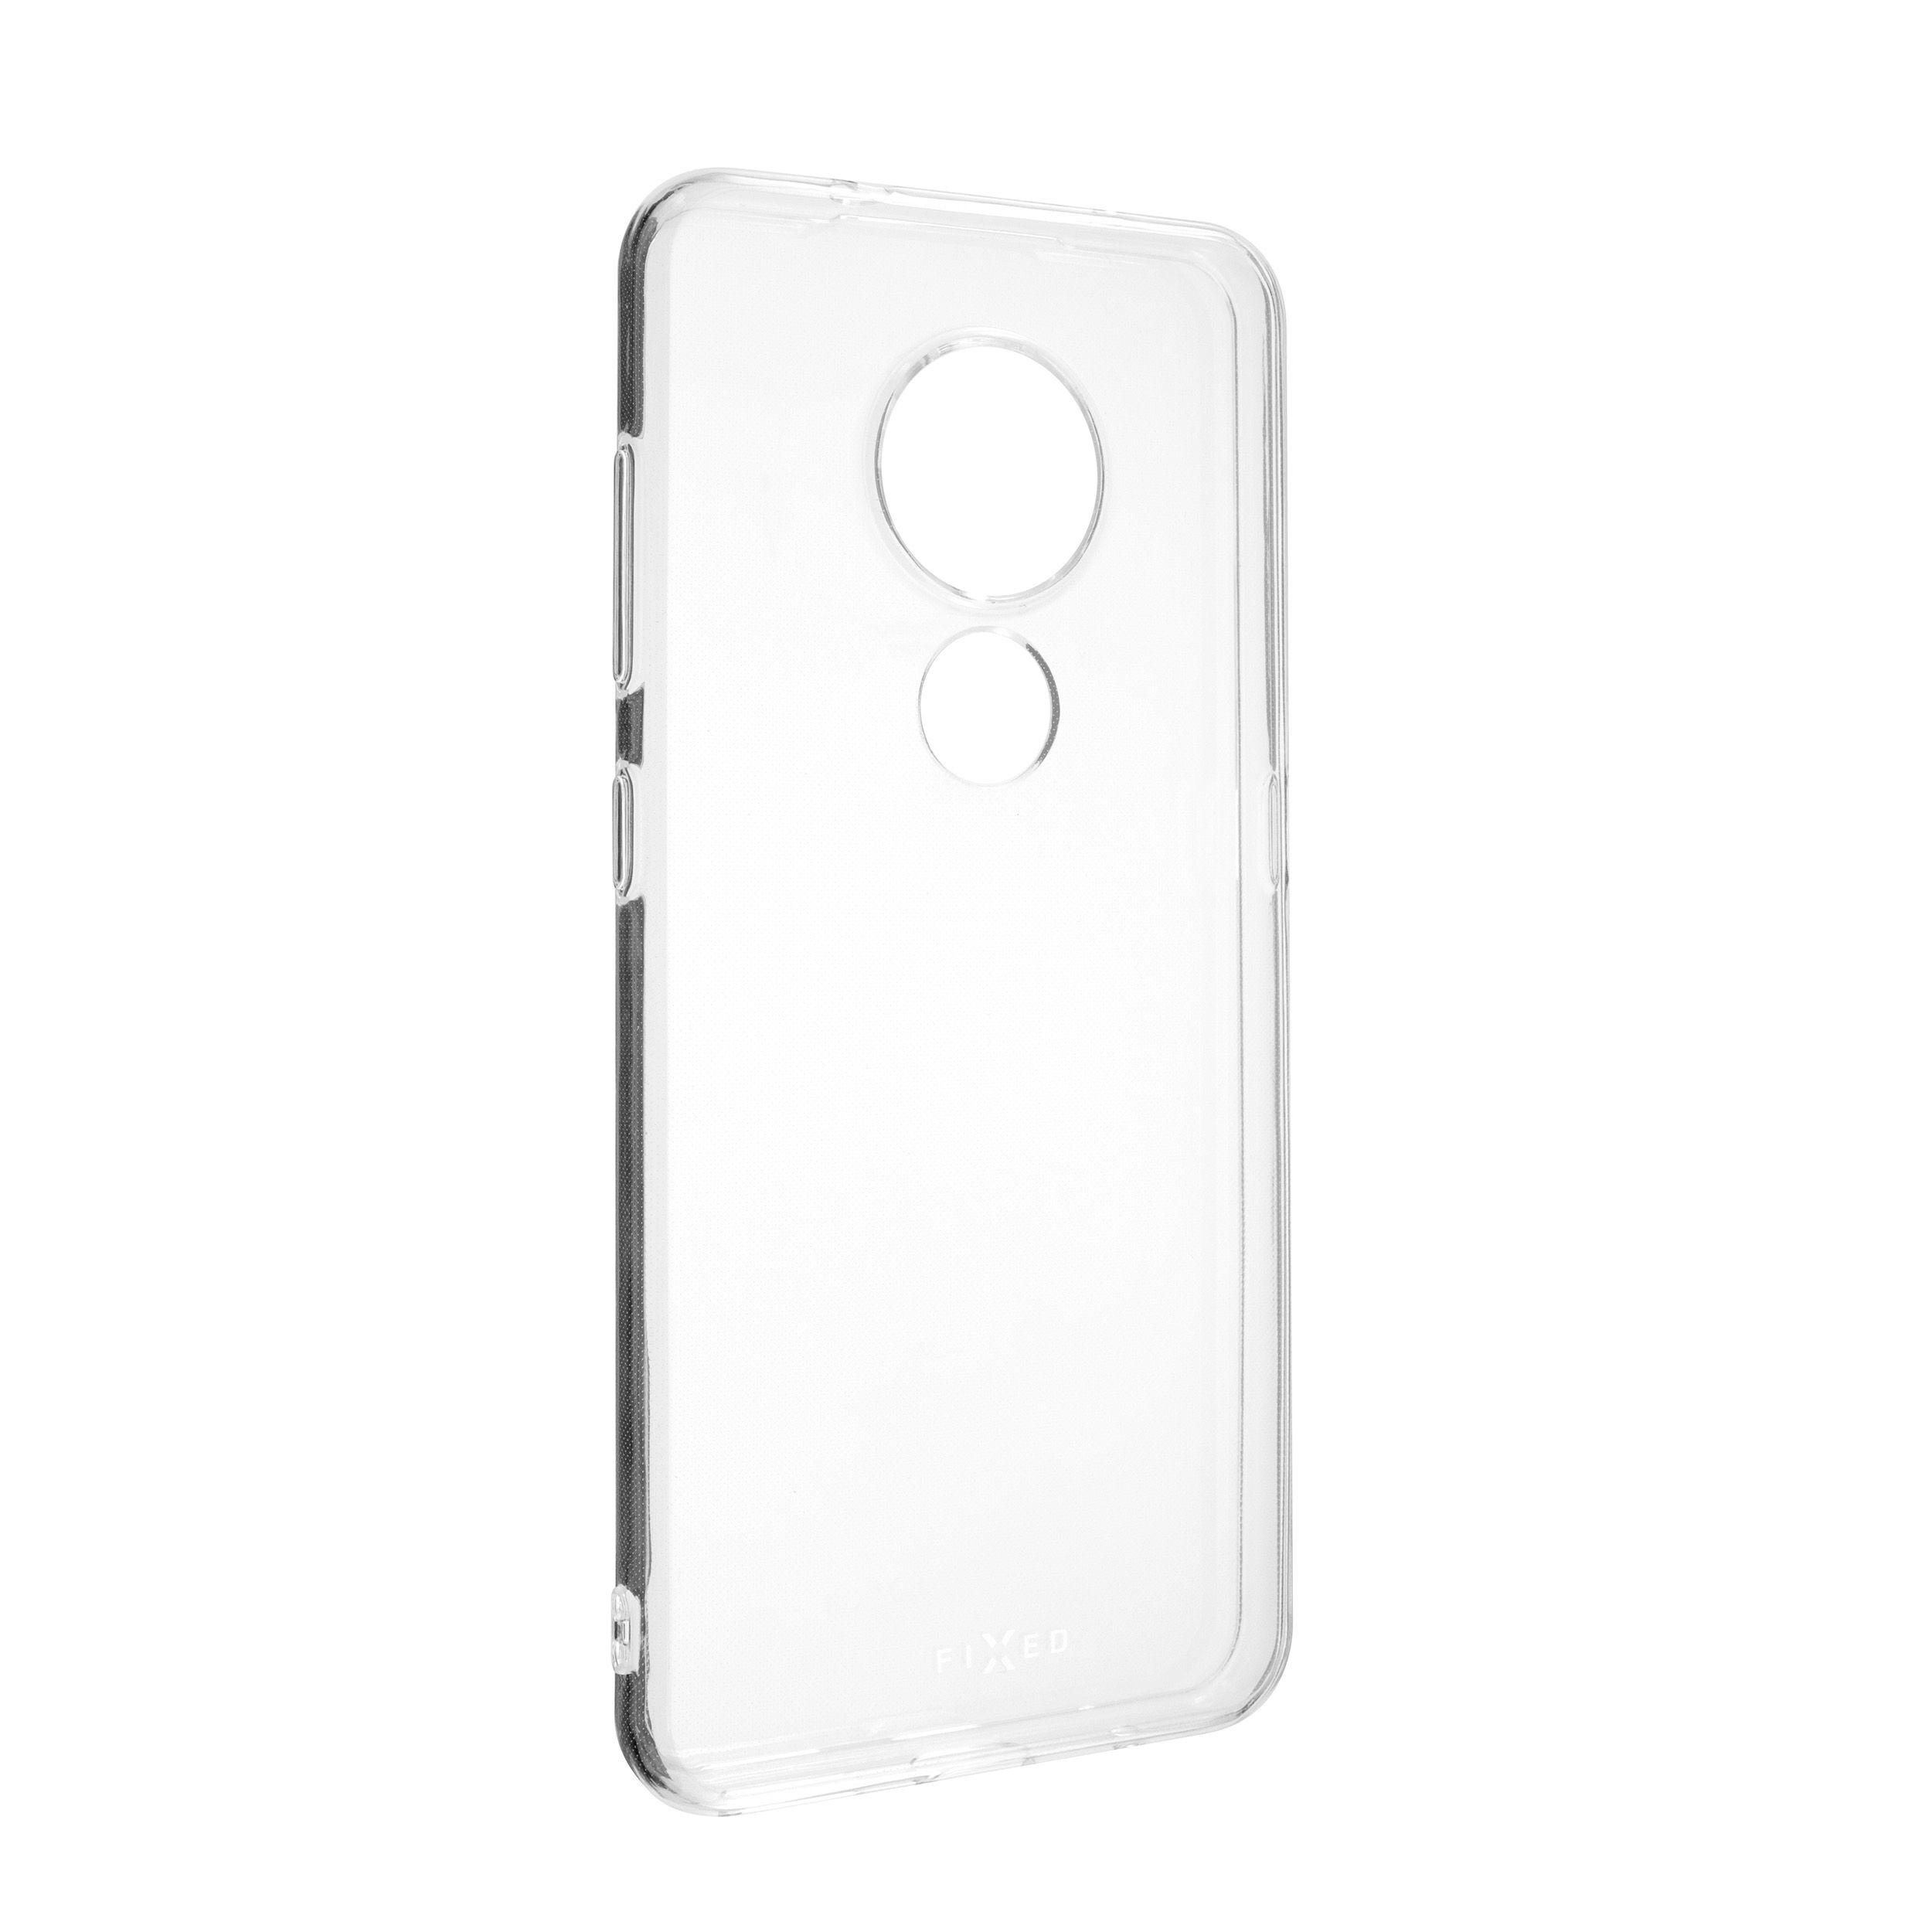 TPU gelové pouzdro FIXED pro Nokia 7.2, čiré